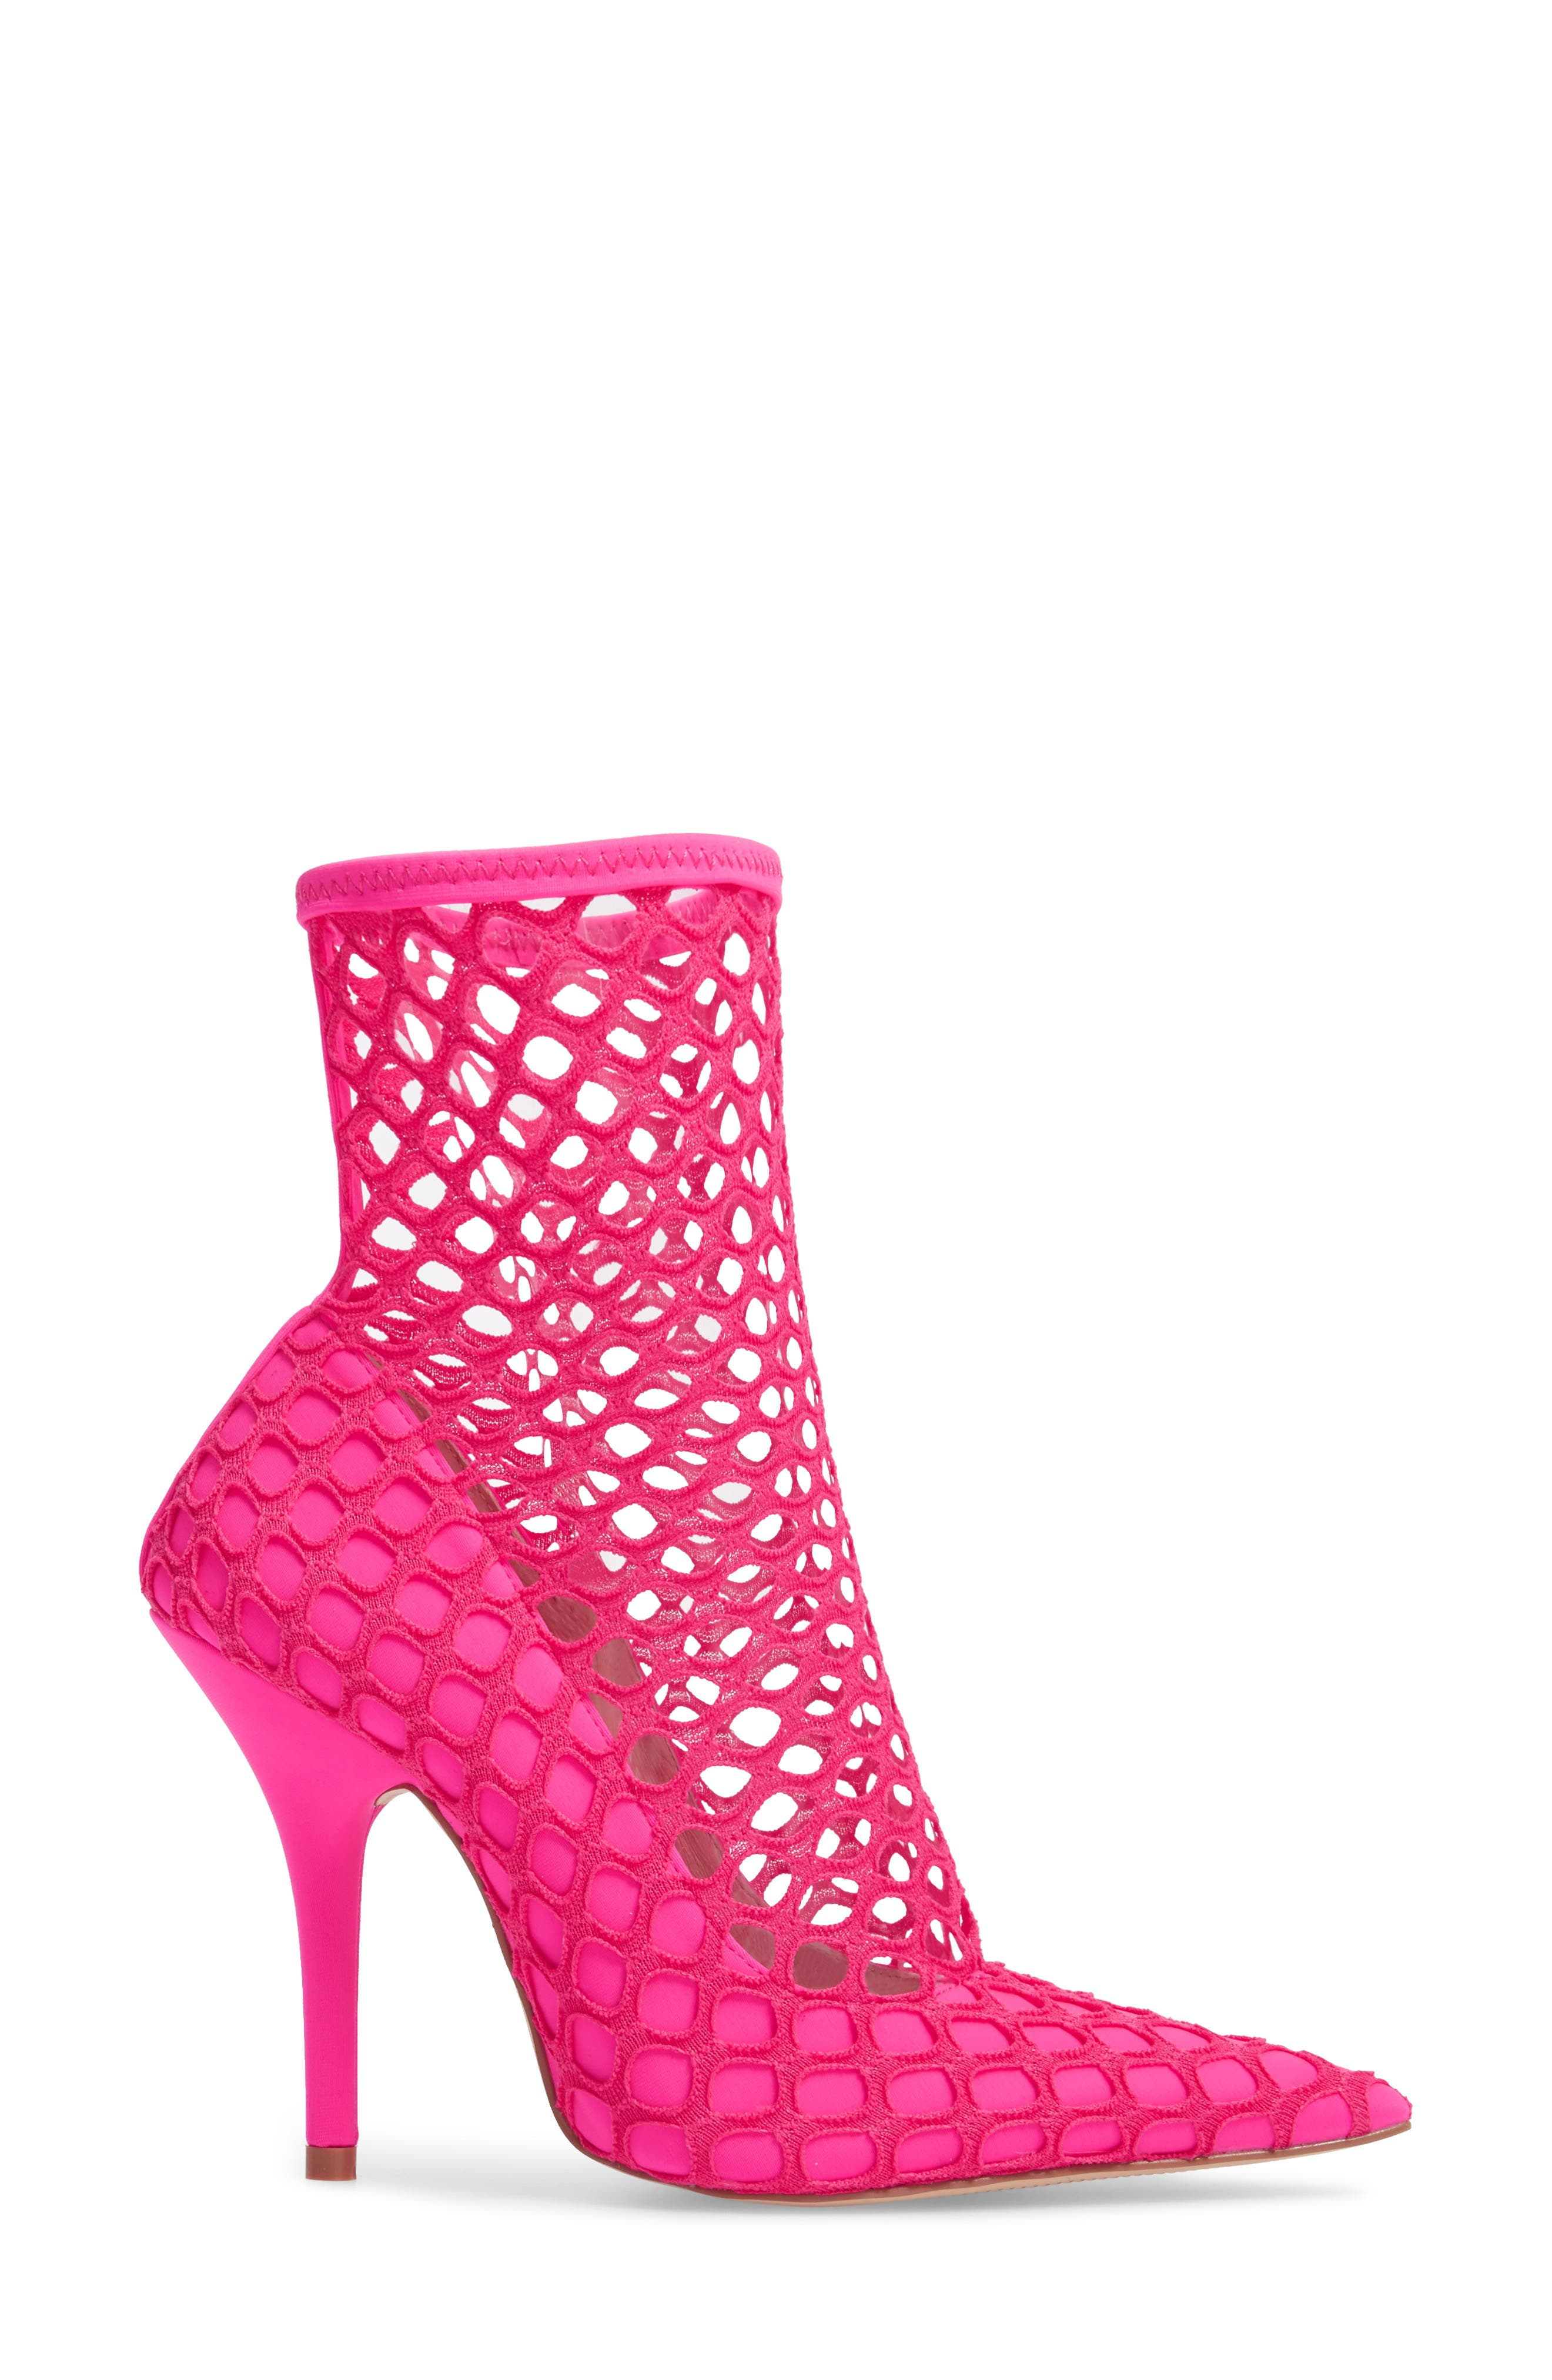 Heidi Mesh Sock Bootie,                             Alternate thumbnail 3, color,                             Neon Pink Fabric